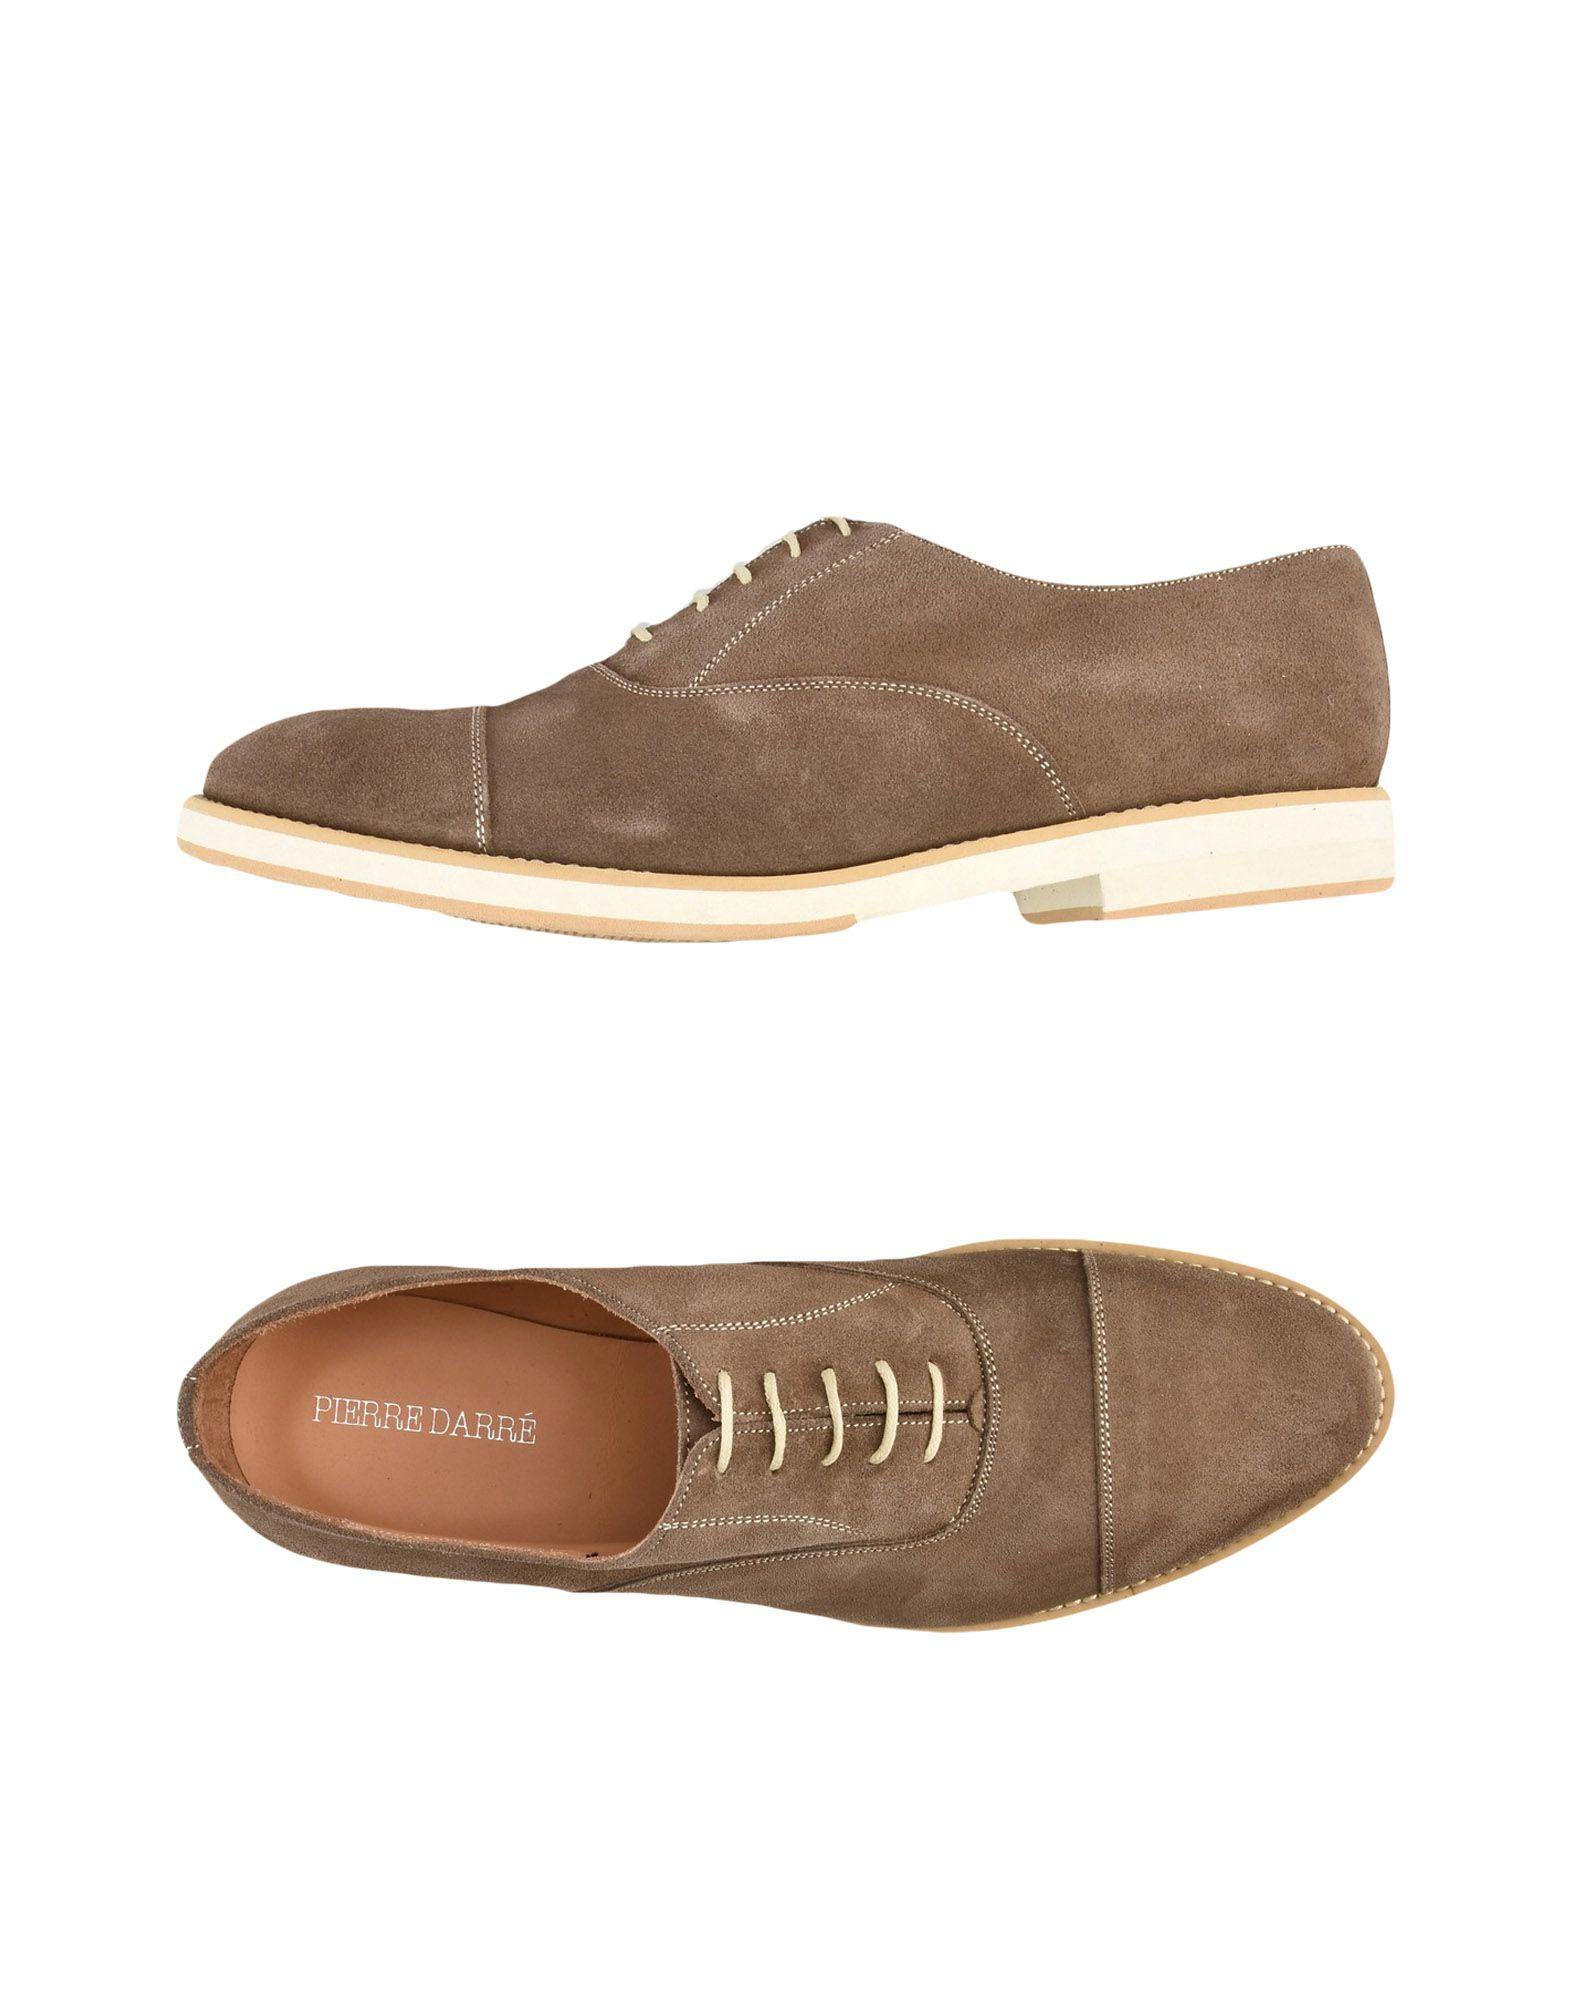 PIERRE DARRÉ Обувь на шнурках pierre hardy обувь на шнурках